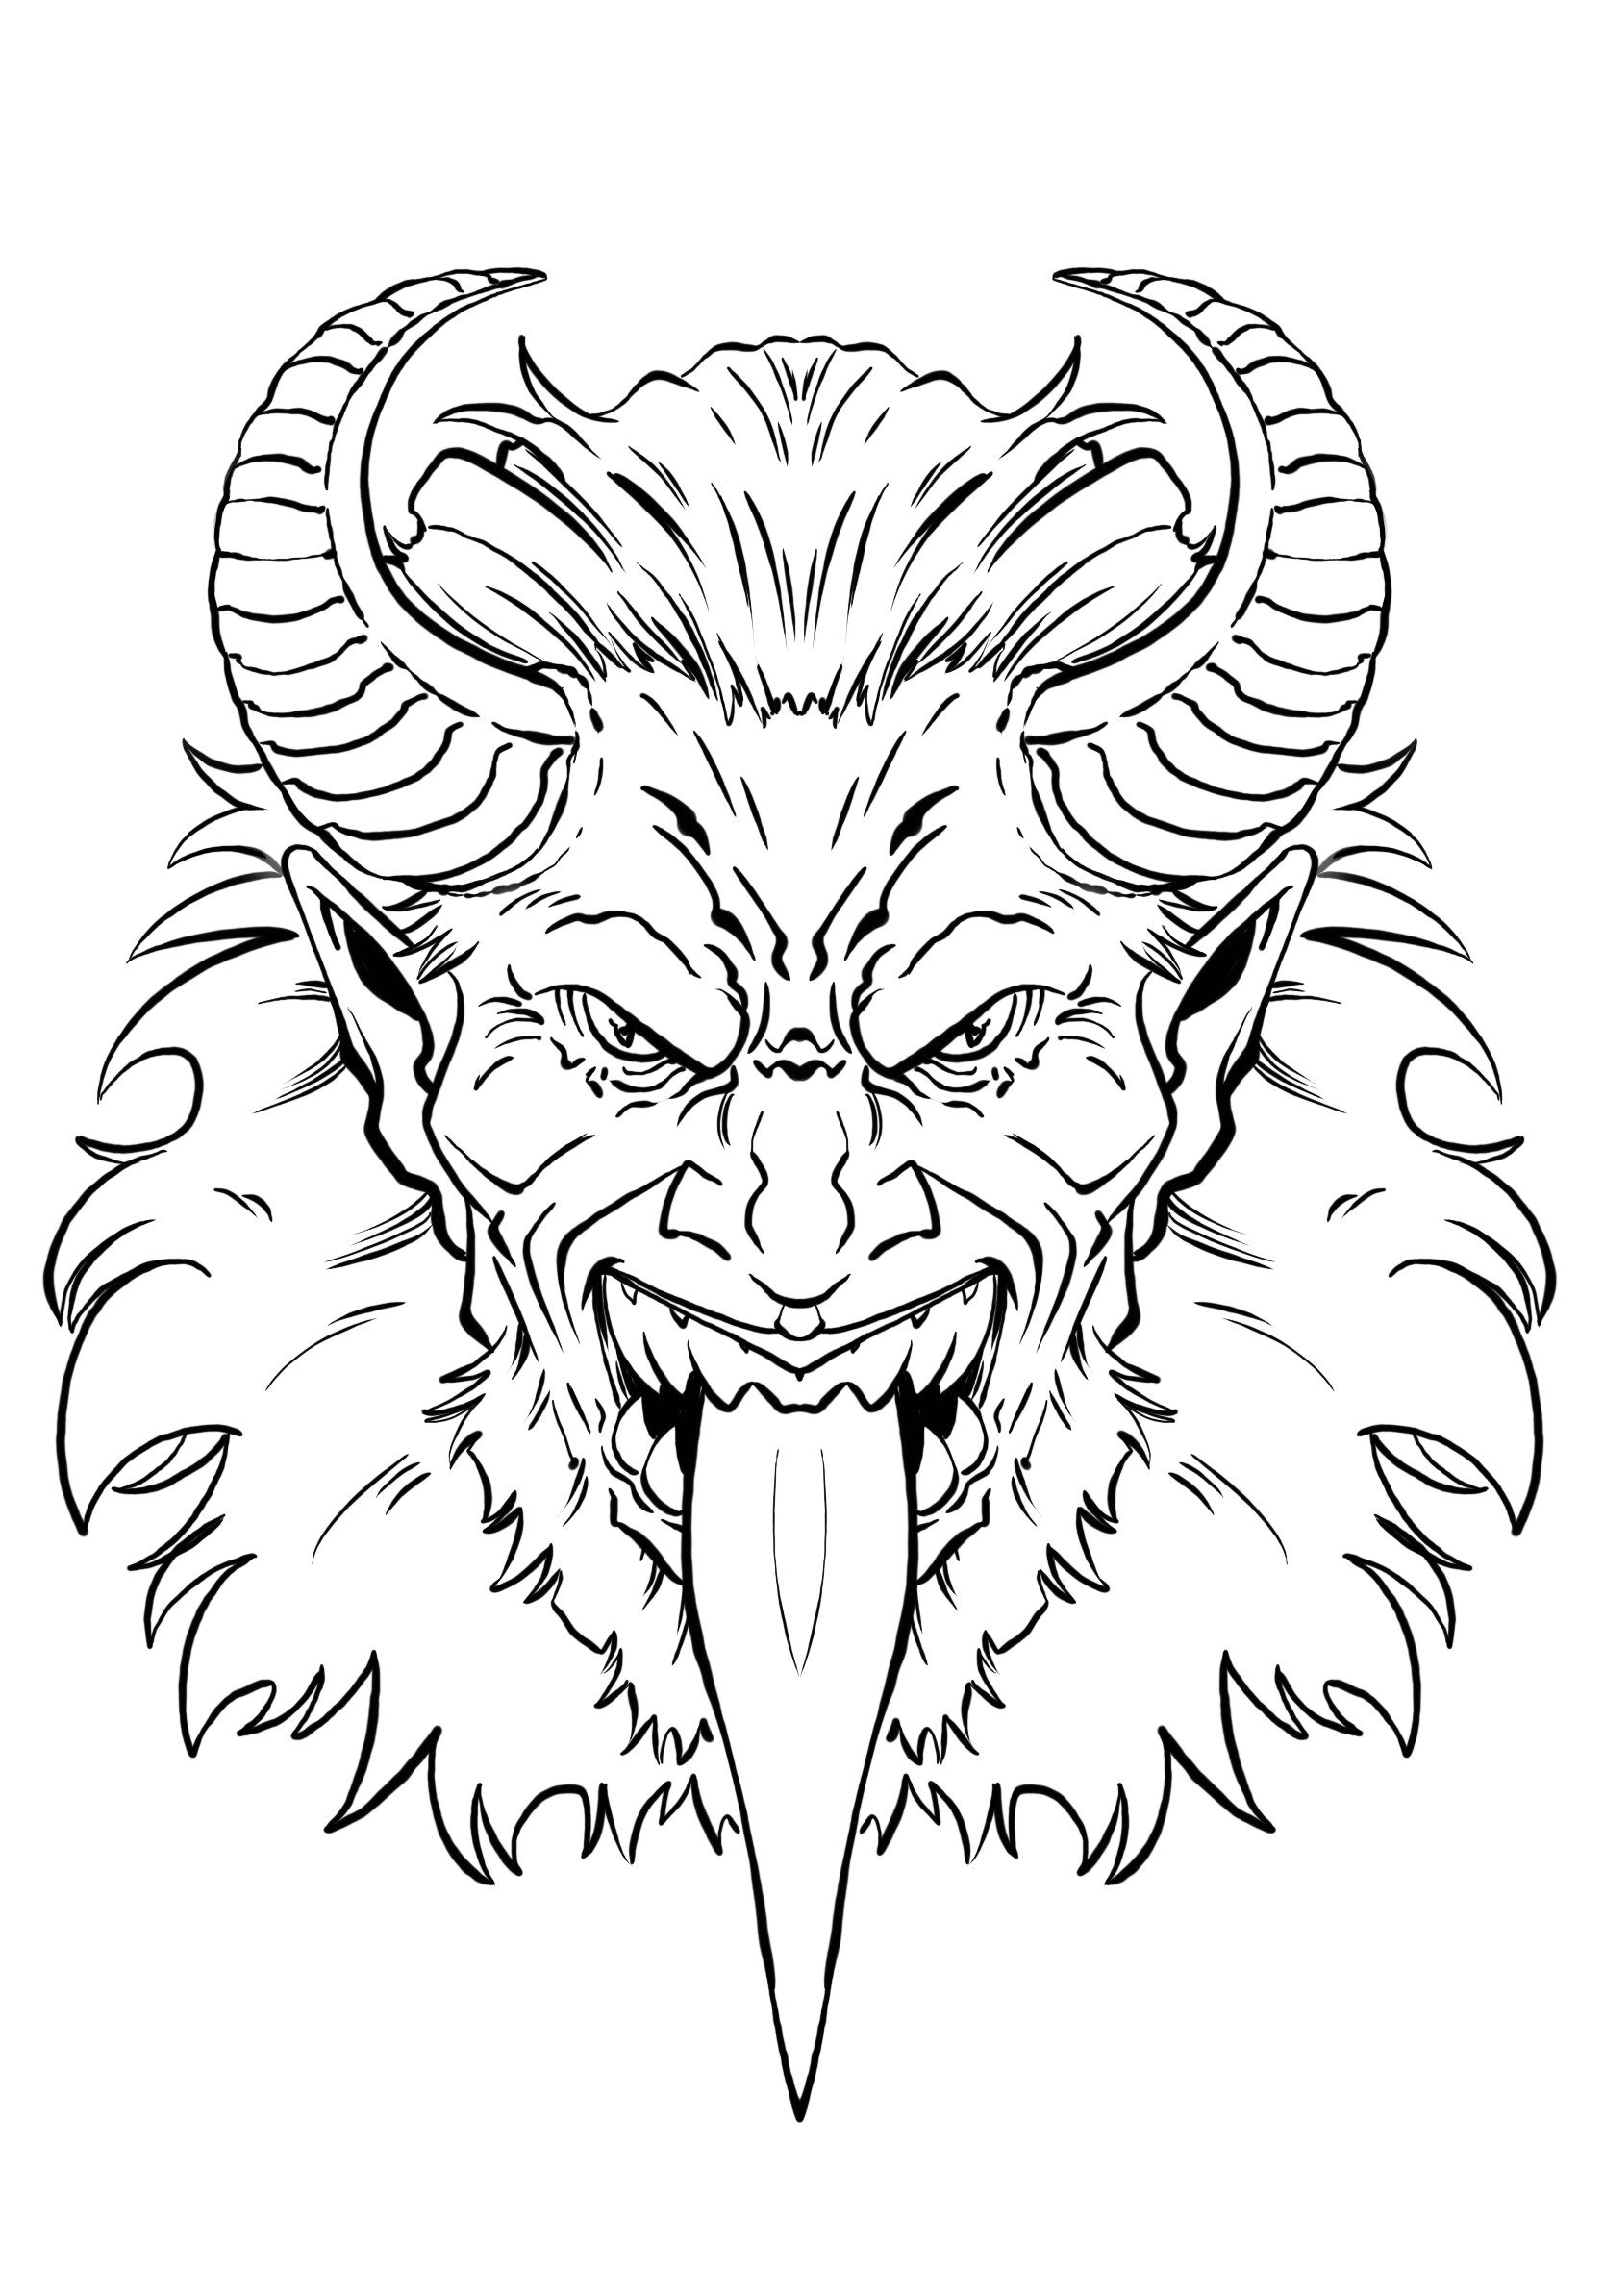 Inked sketch done in Autodesk Sketchbook, before vectors in Affinity Designer.